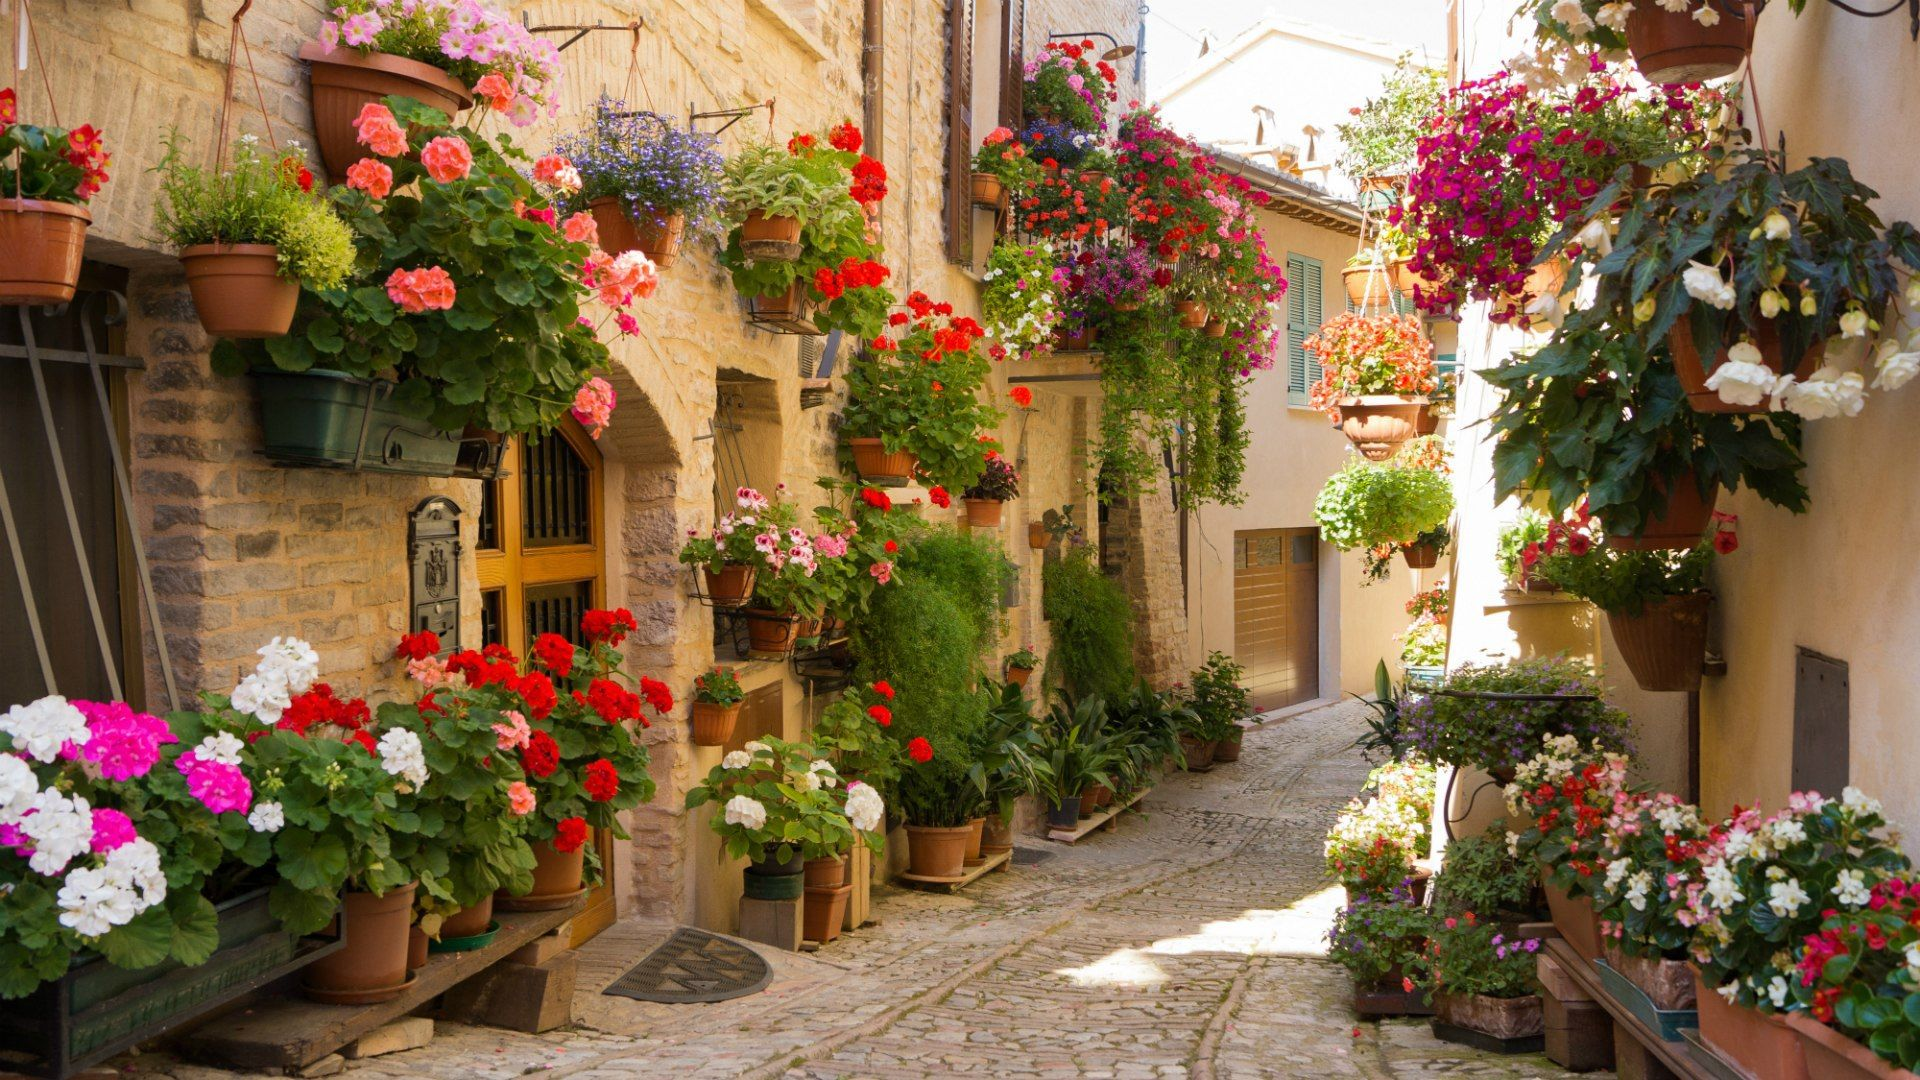 Blooming Umbria Italy View Wallpaper Mediterranean Landscaping Custom Murals